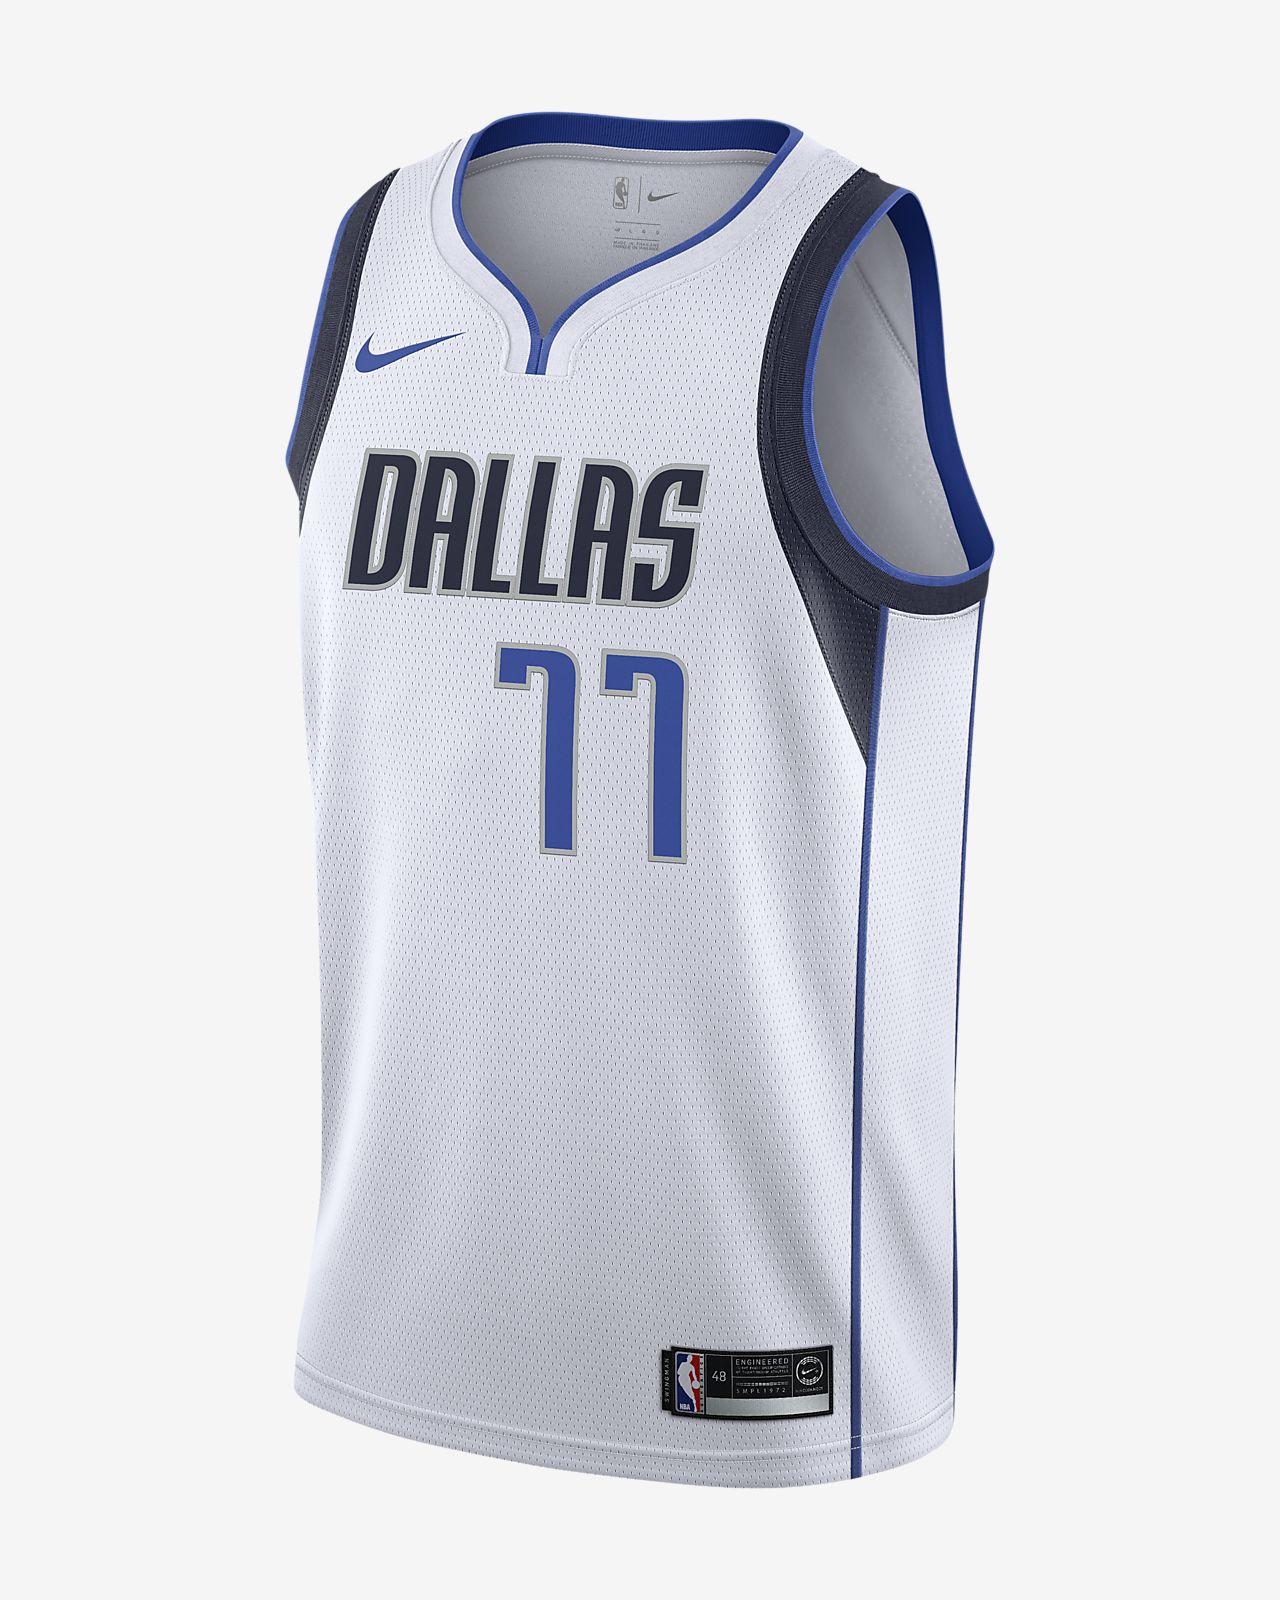 Maillot Nike NBA Swingman Luka Doncic Mavericks Association Edition